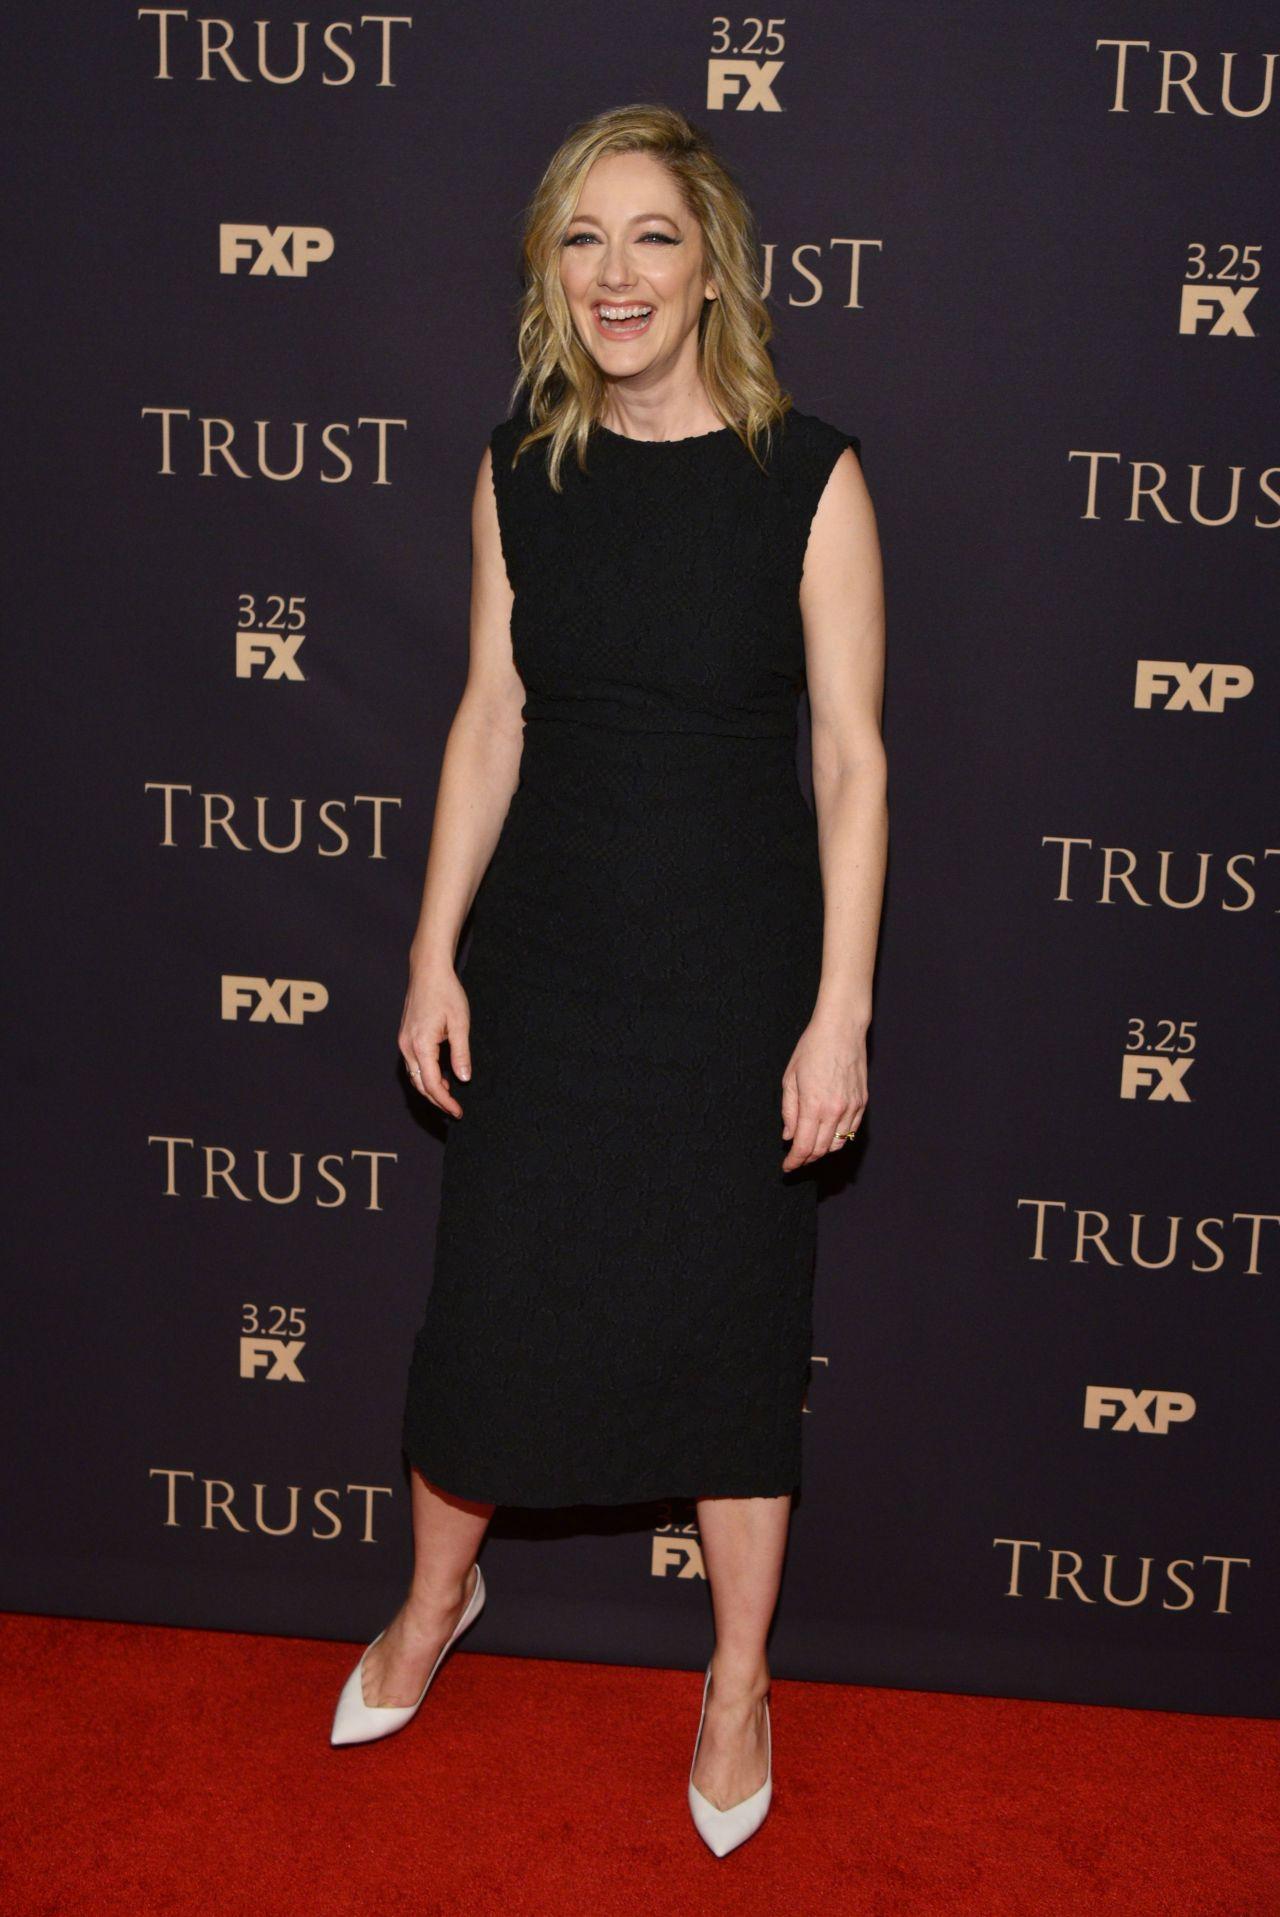 Olivia Wilde Golden Globes 2017